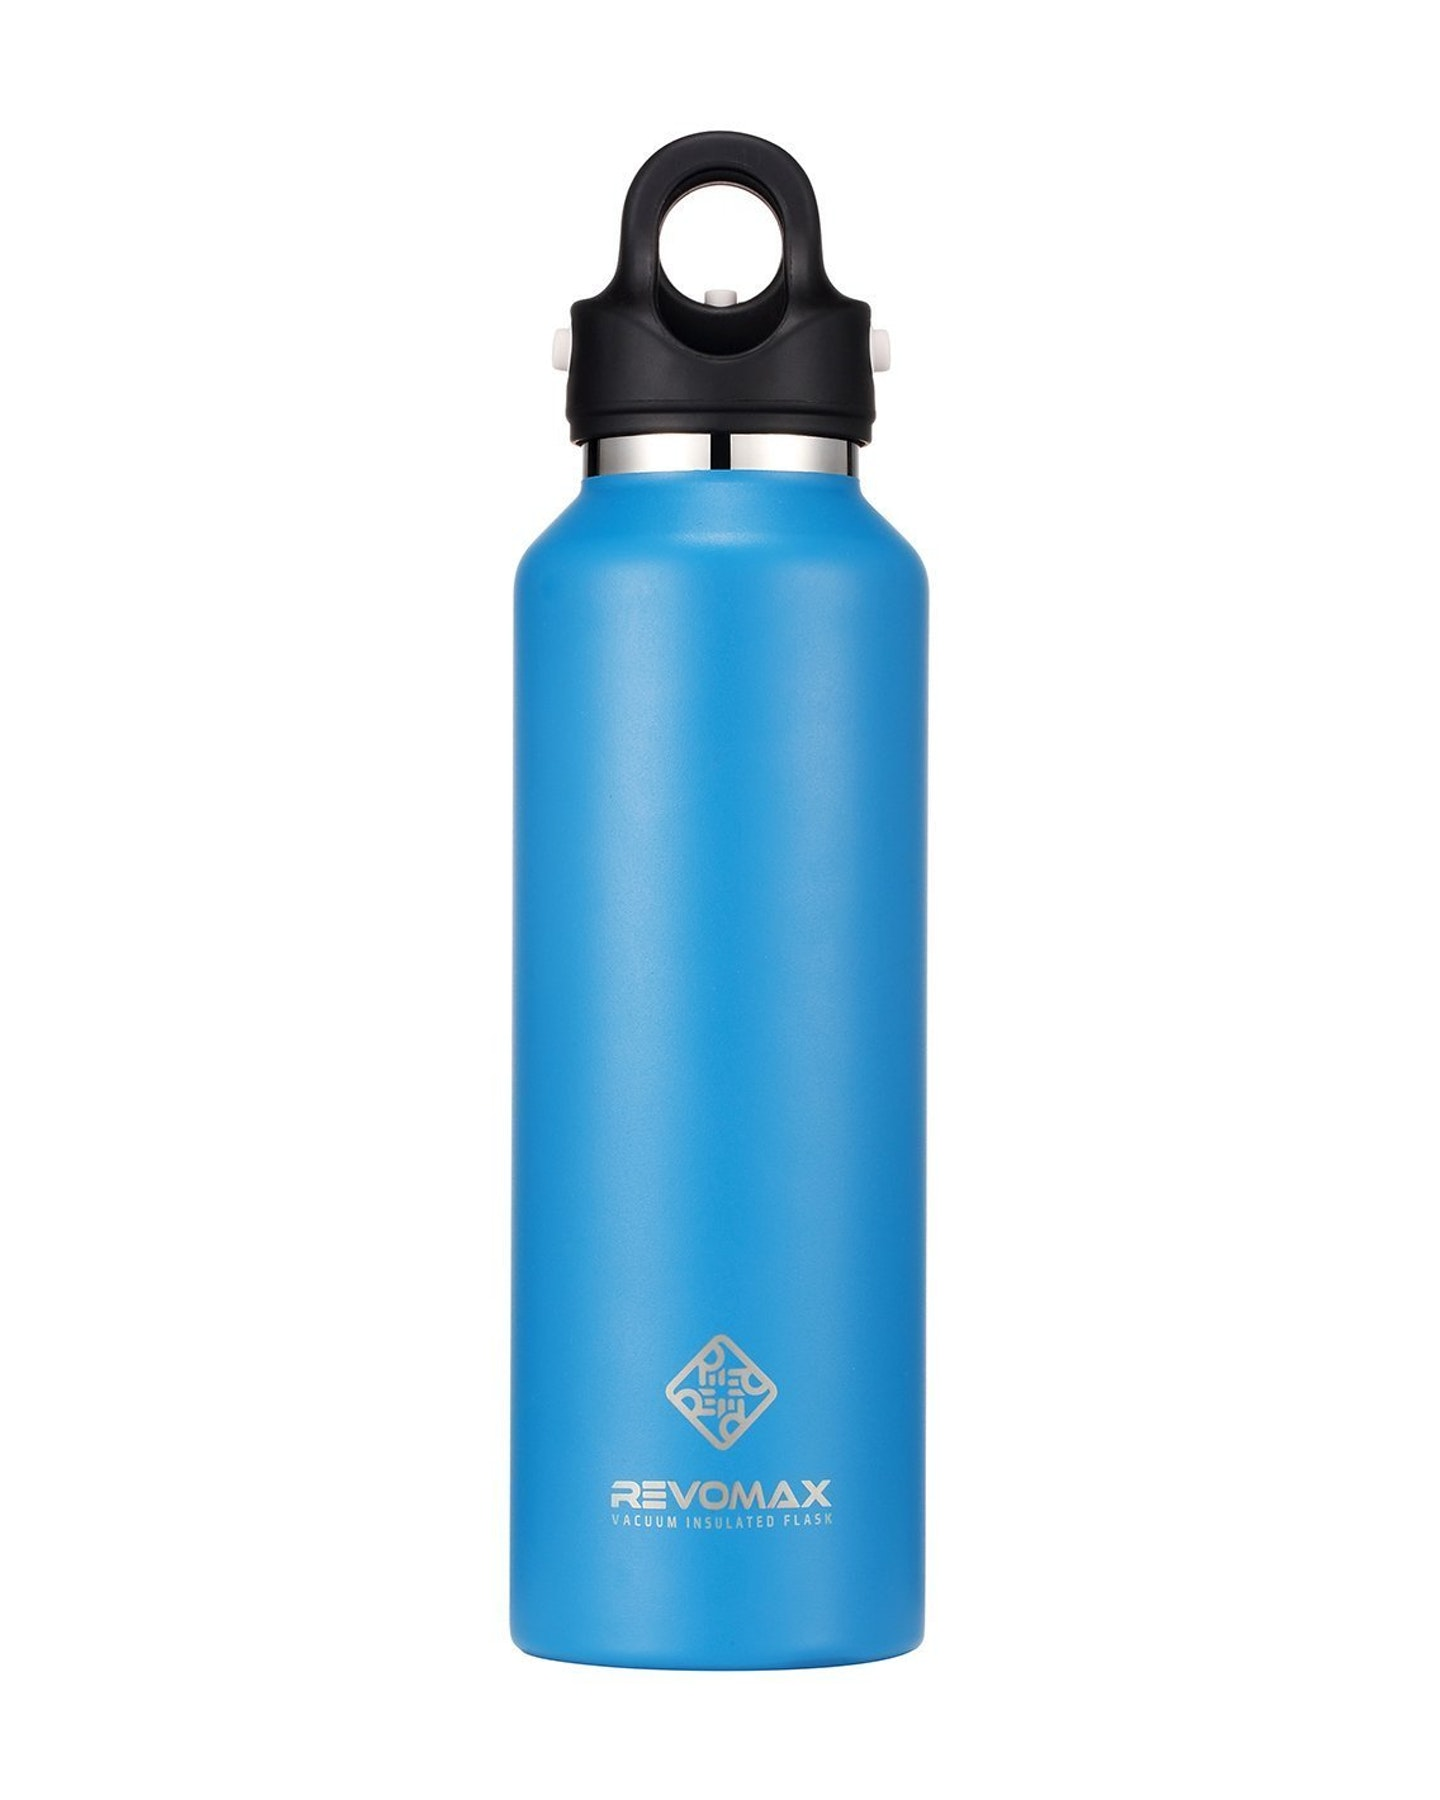 Revomax 592Ml - 20Oz Insulated Flask Drink Bottle Jewelry Blue